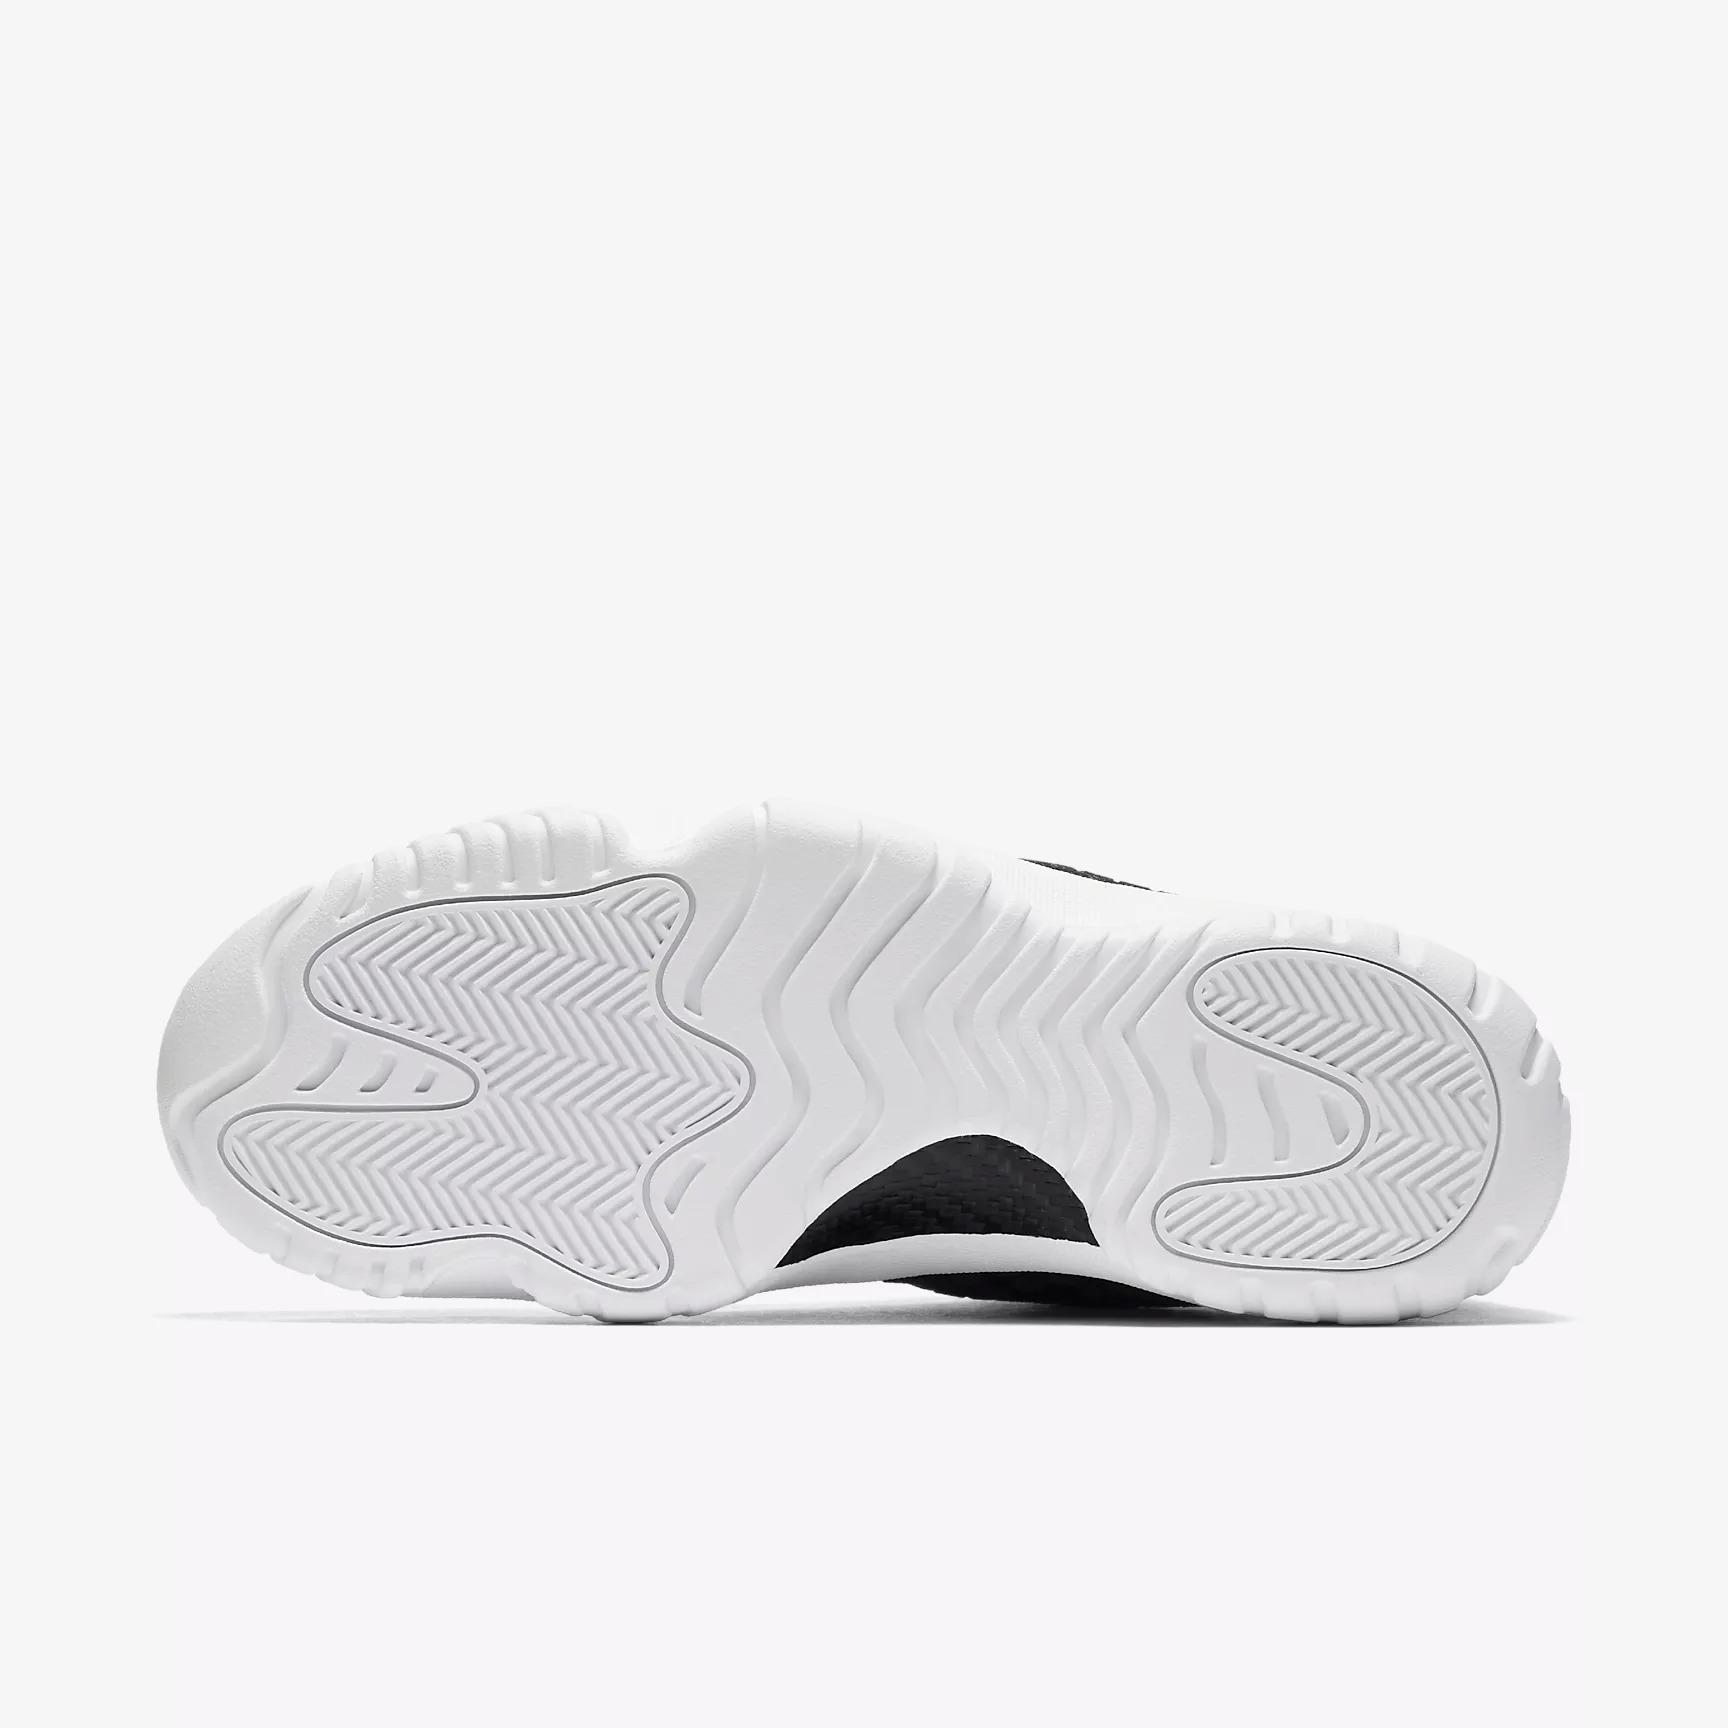 sports shoes 14f78 2d93d Air Jordan Future Low Sneakers